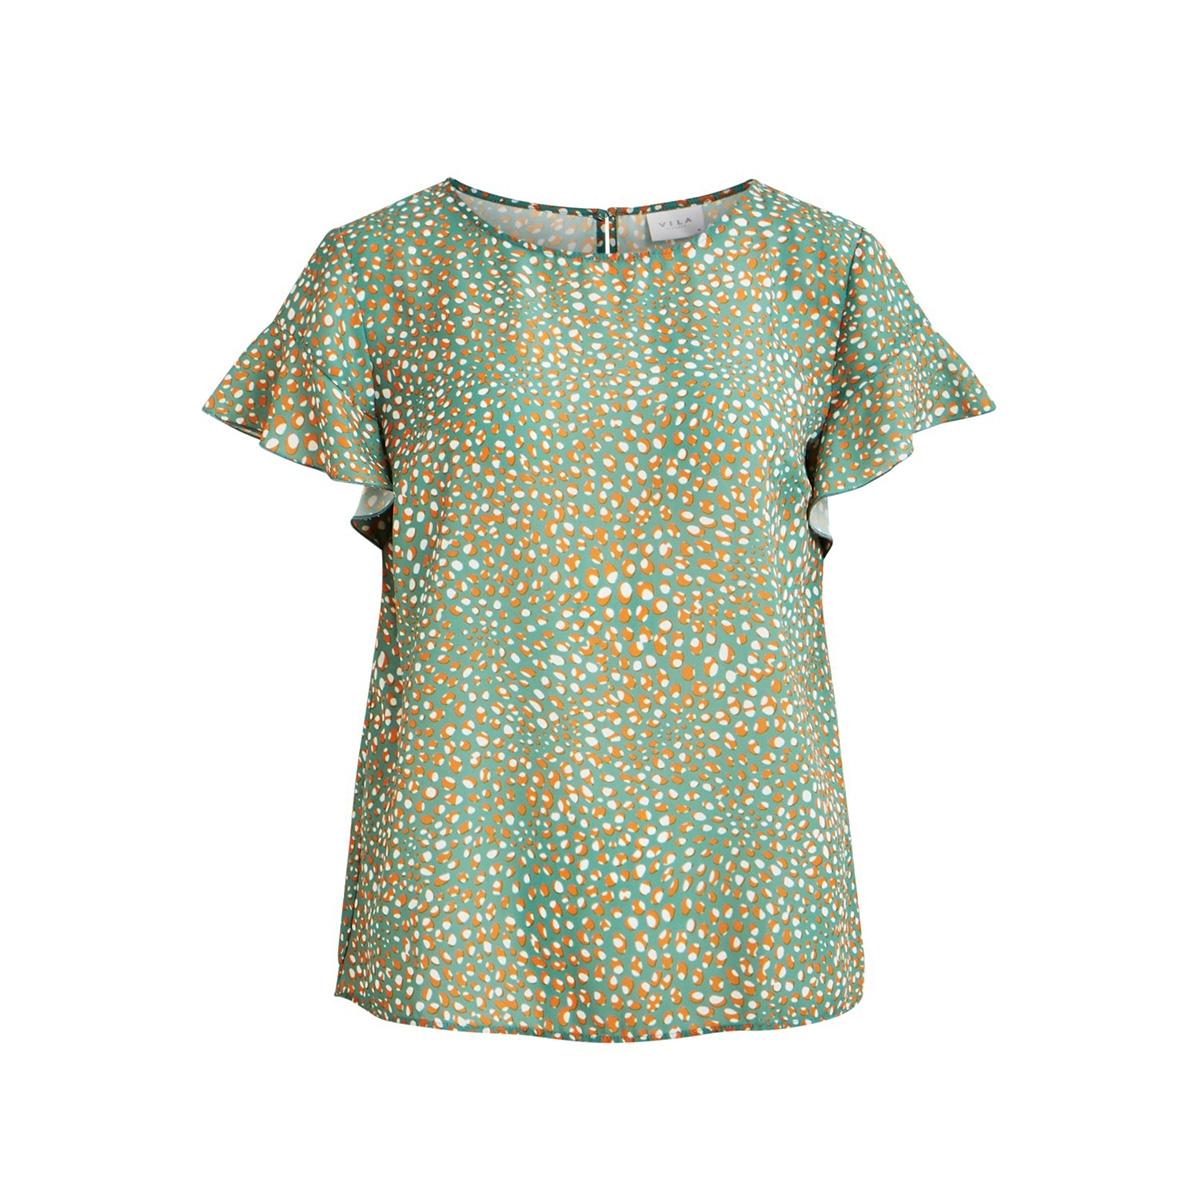 vilucy s/s flounce top - fav lux 14049944 vila t-shirt oil blue/golden oak